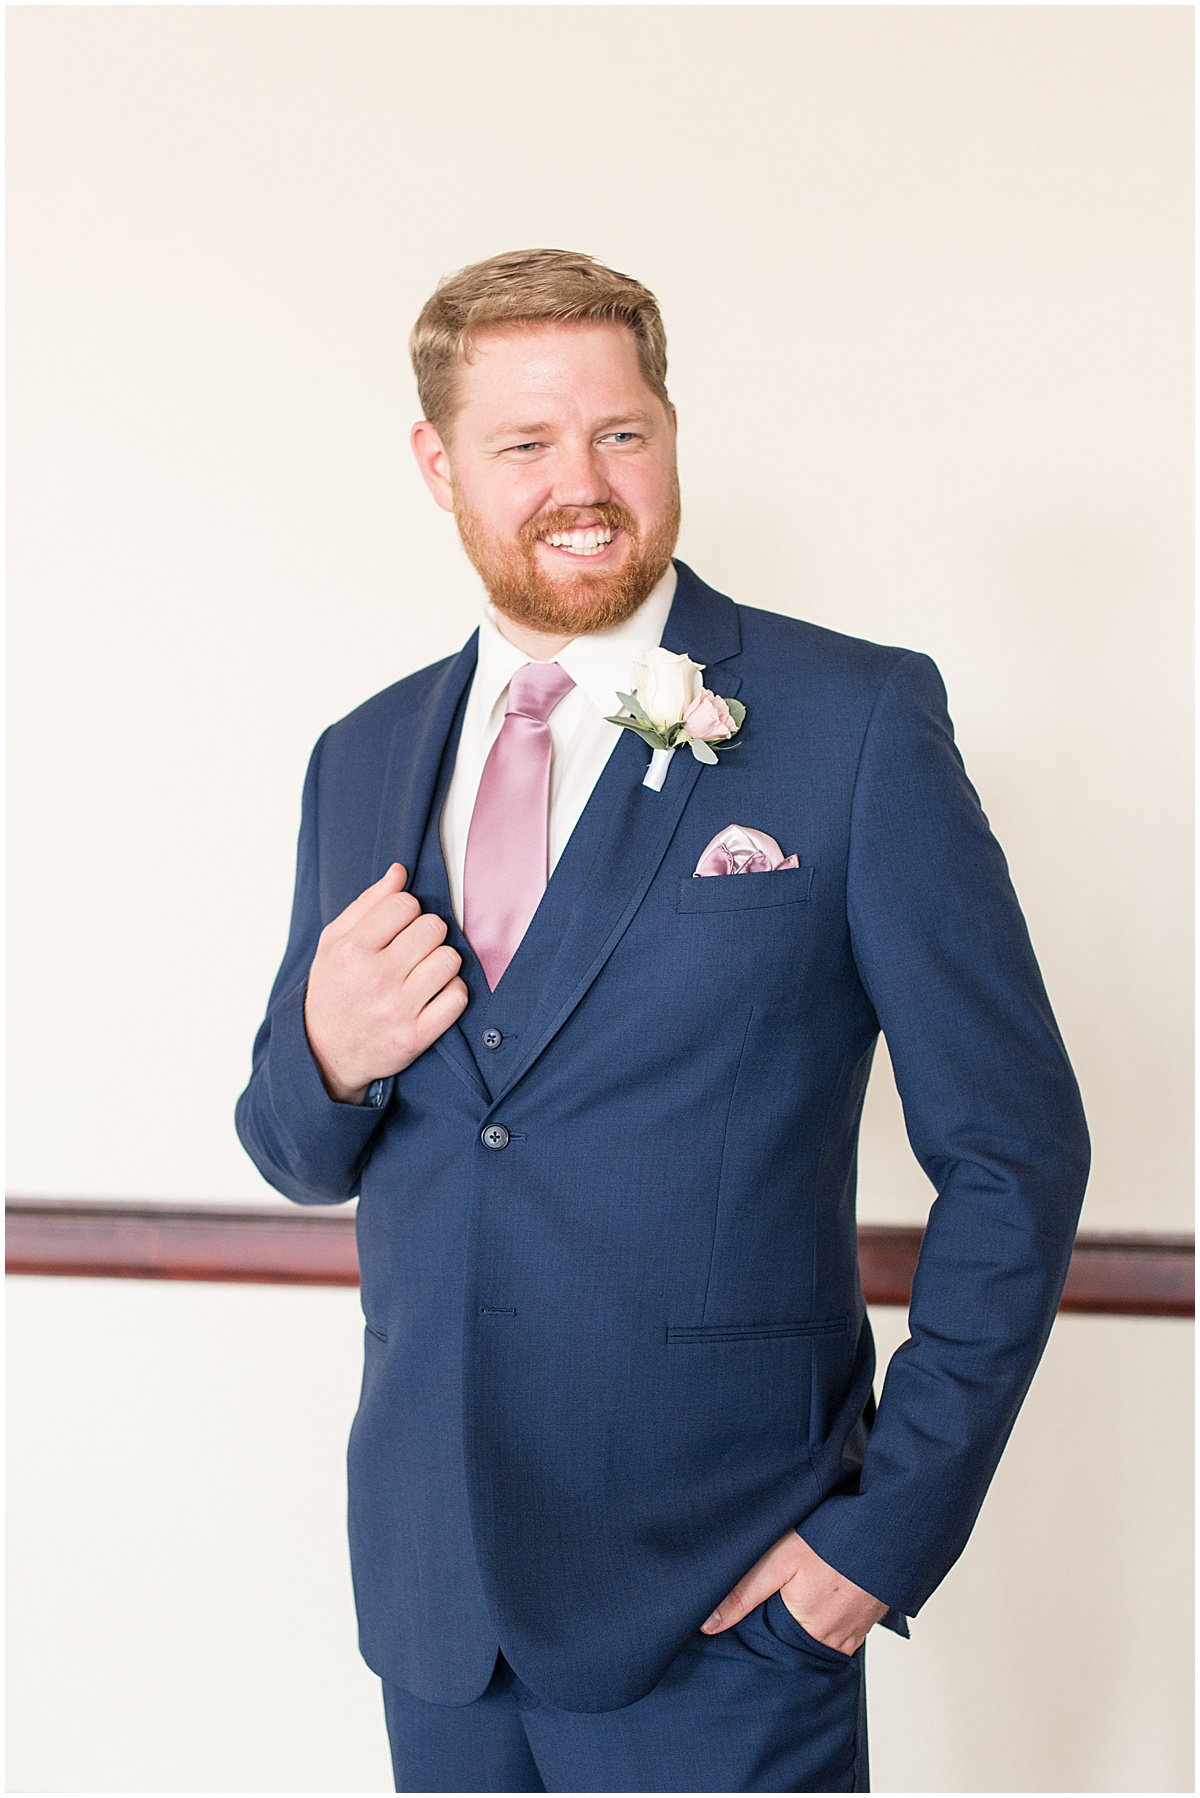 Groom at Spohn Ballroom wedding in Goshen, Indiana